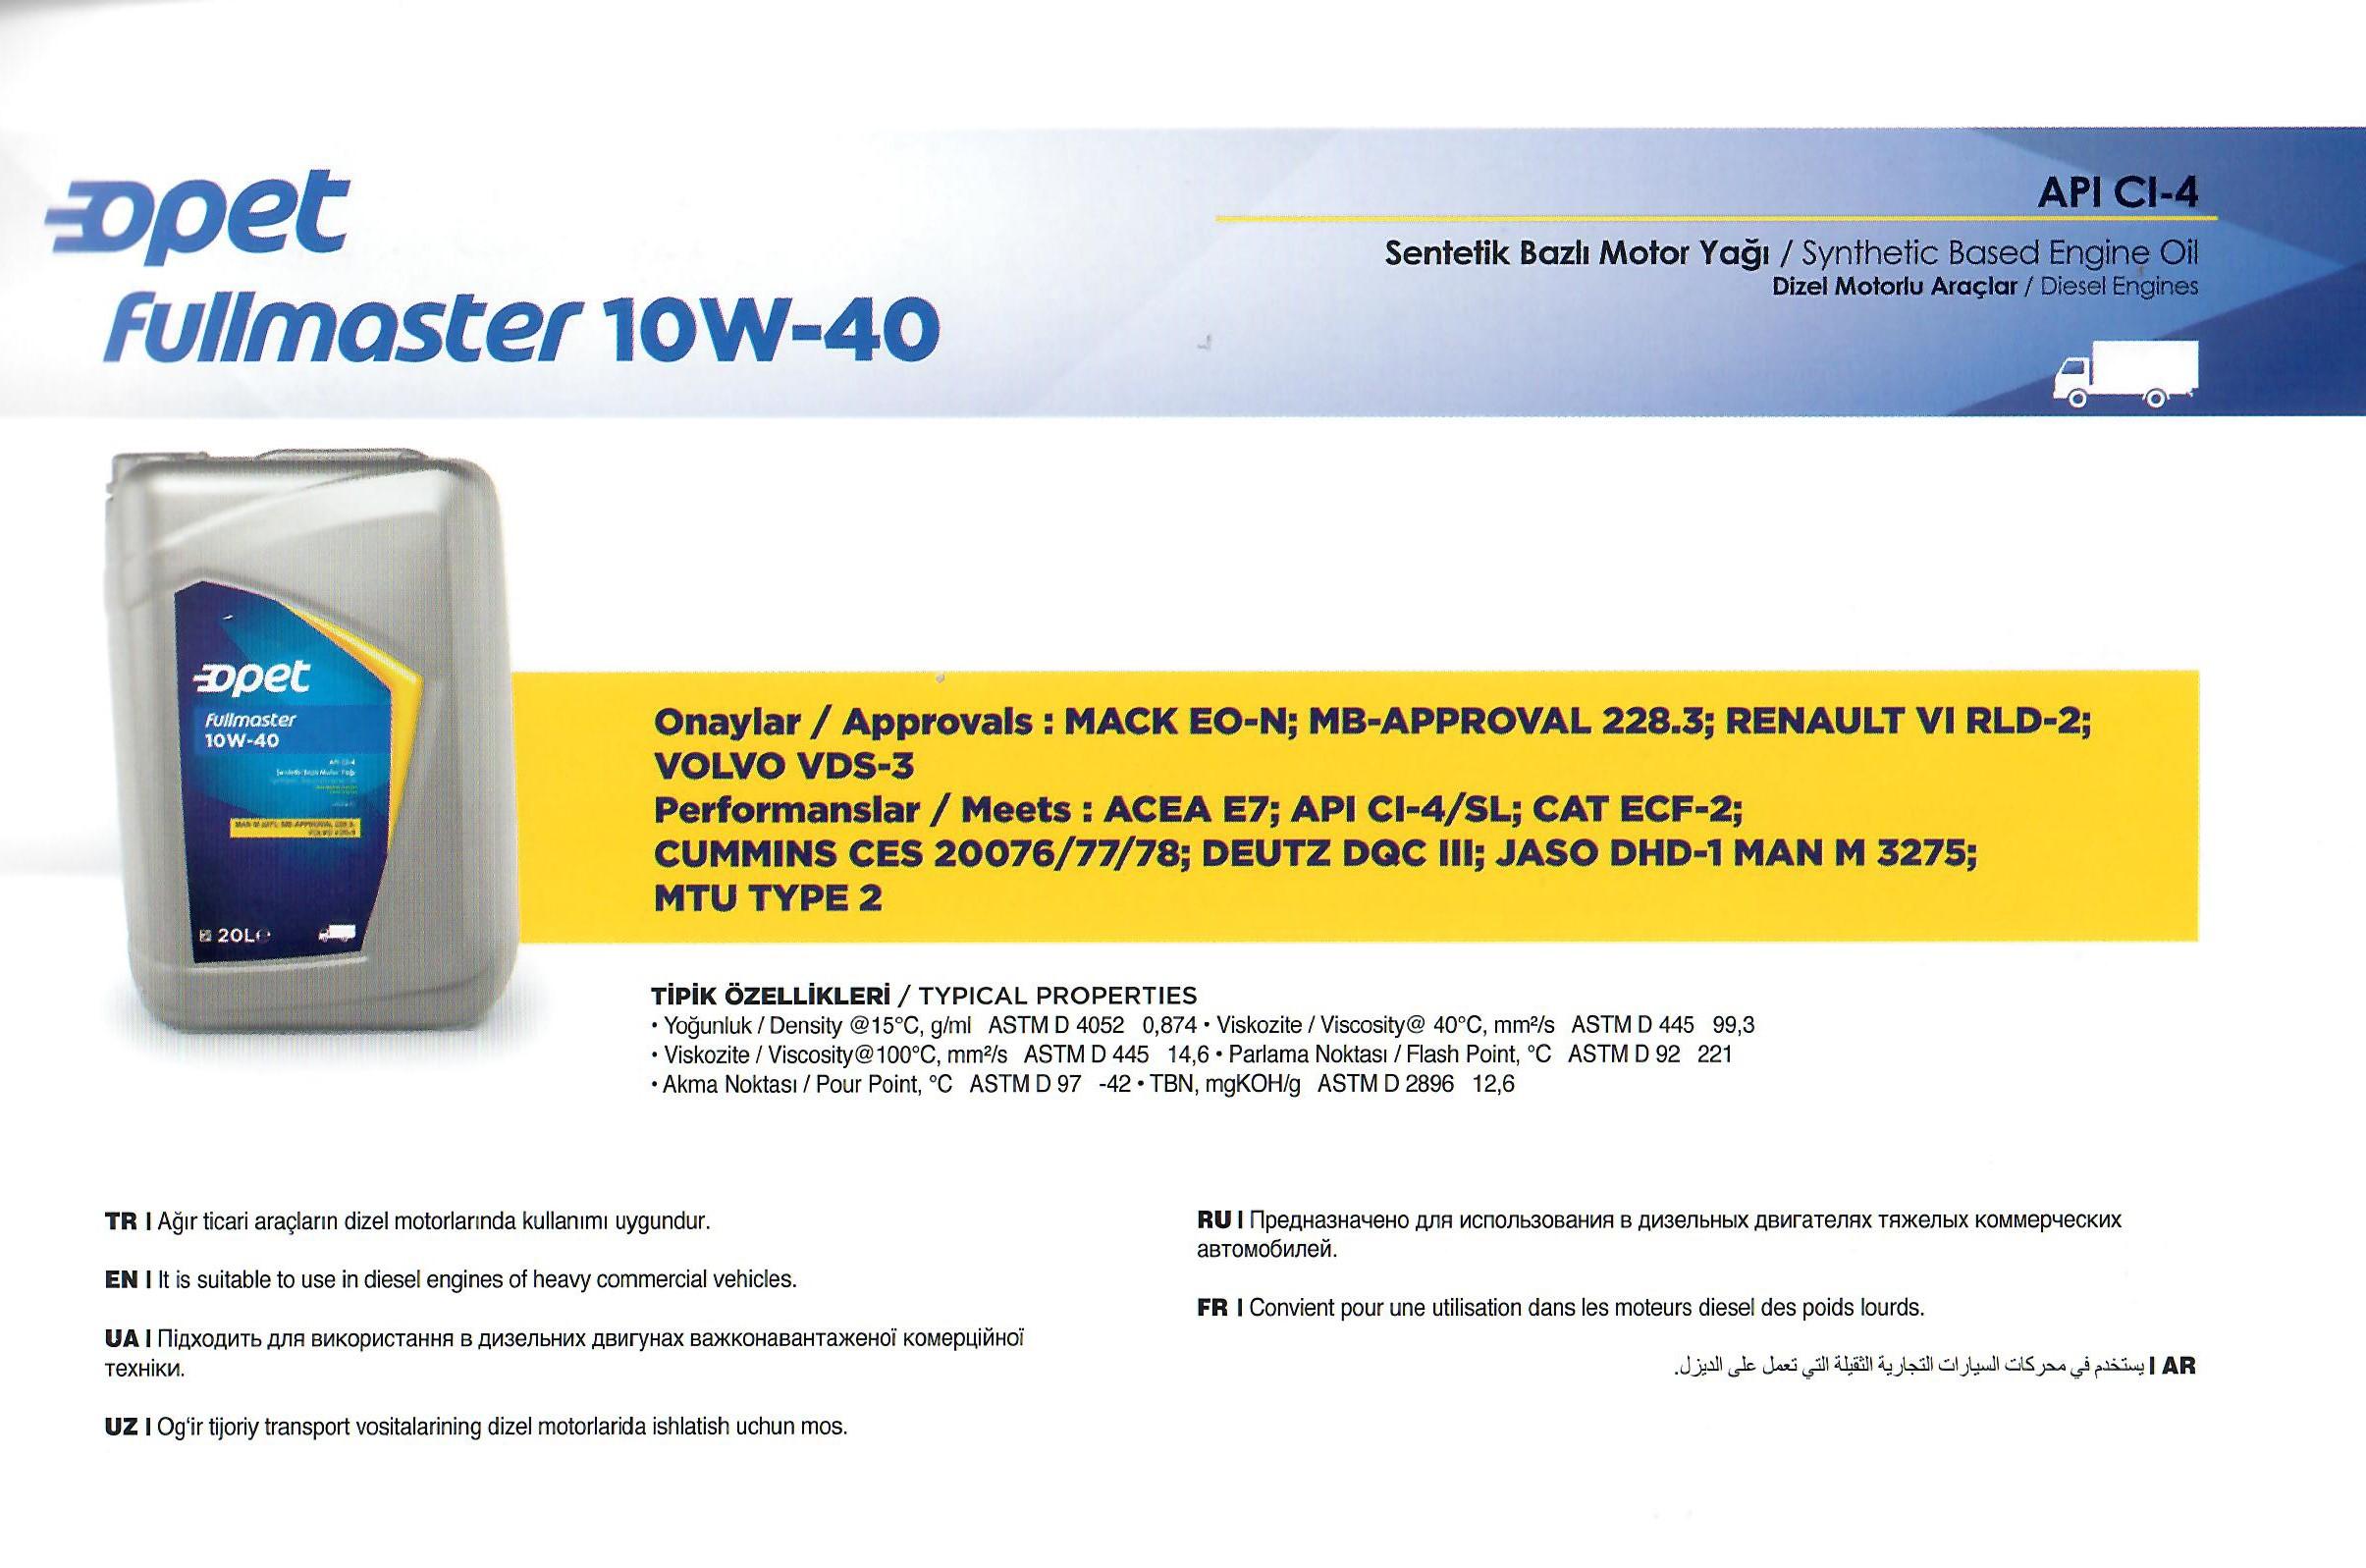 فولماستر 10W-40